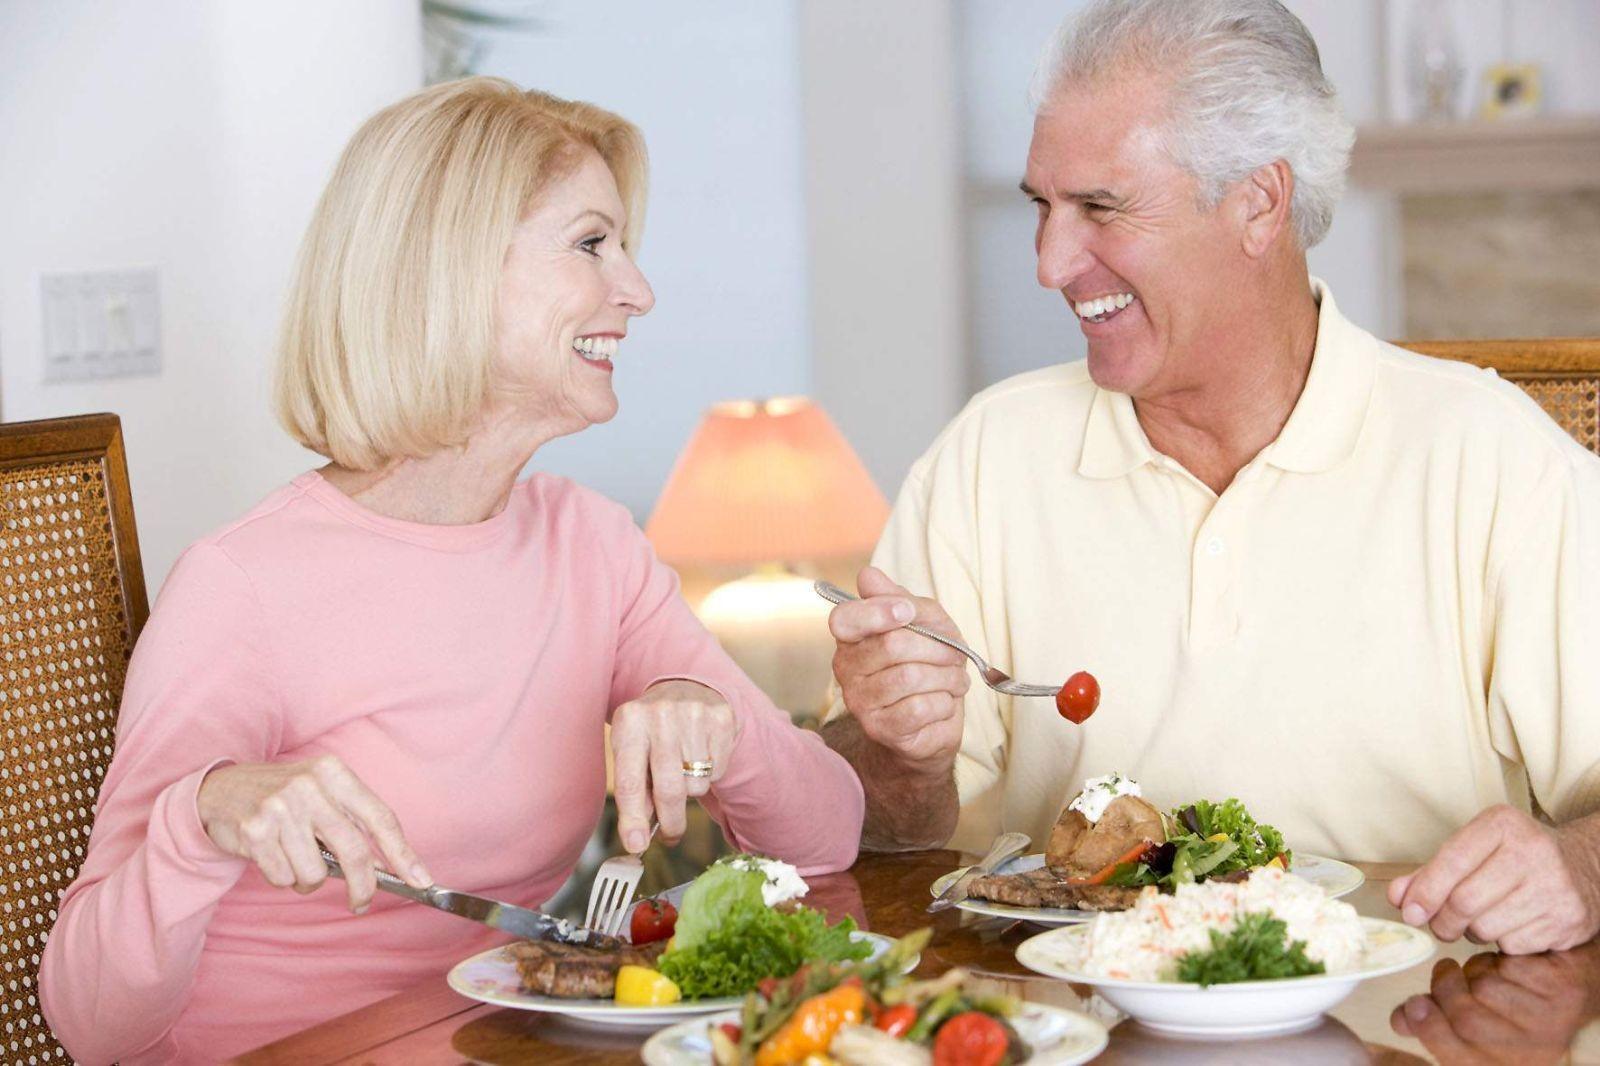 dinh dưỡng người cao tuổi 1